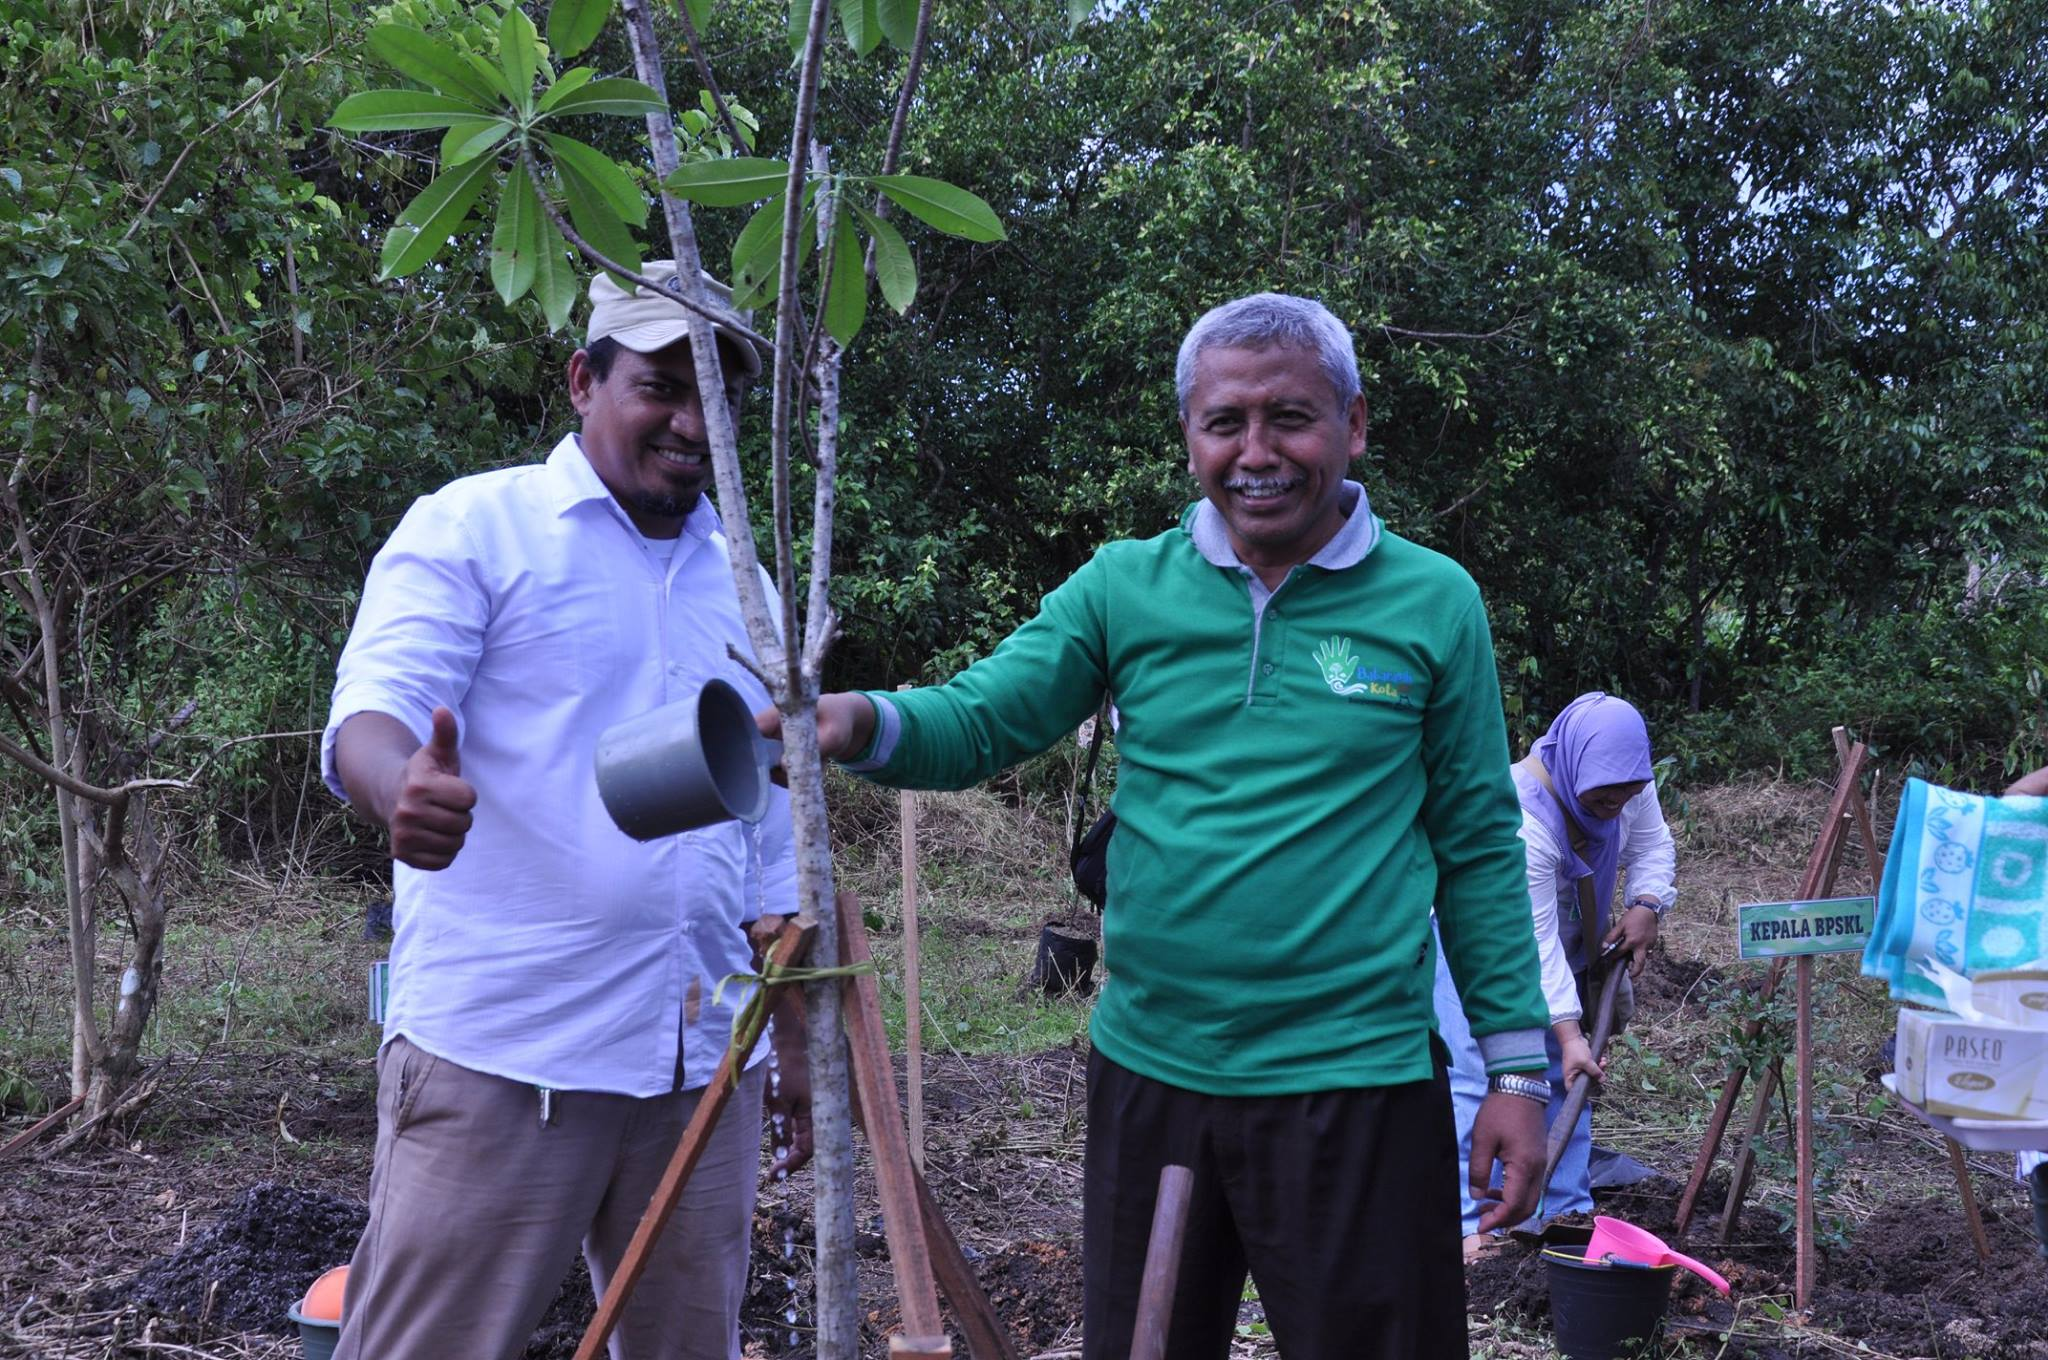 Penanaman pohon bintaro oleh Dirjen PDASHL disaksikan Kepala BPDASHL Barito